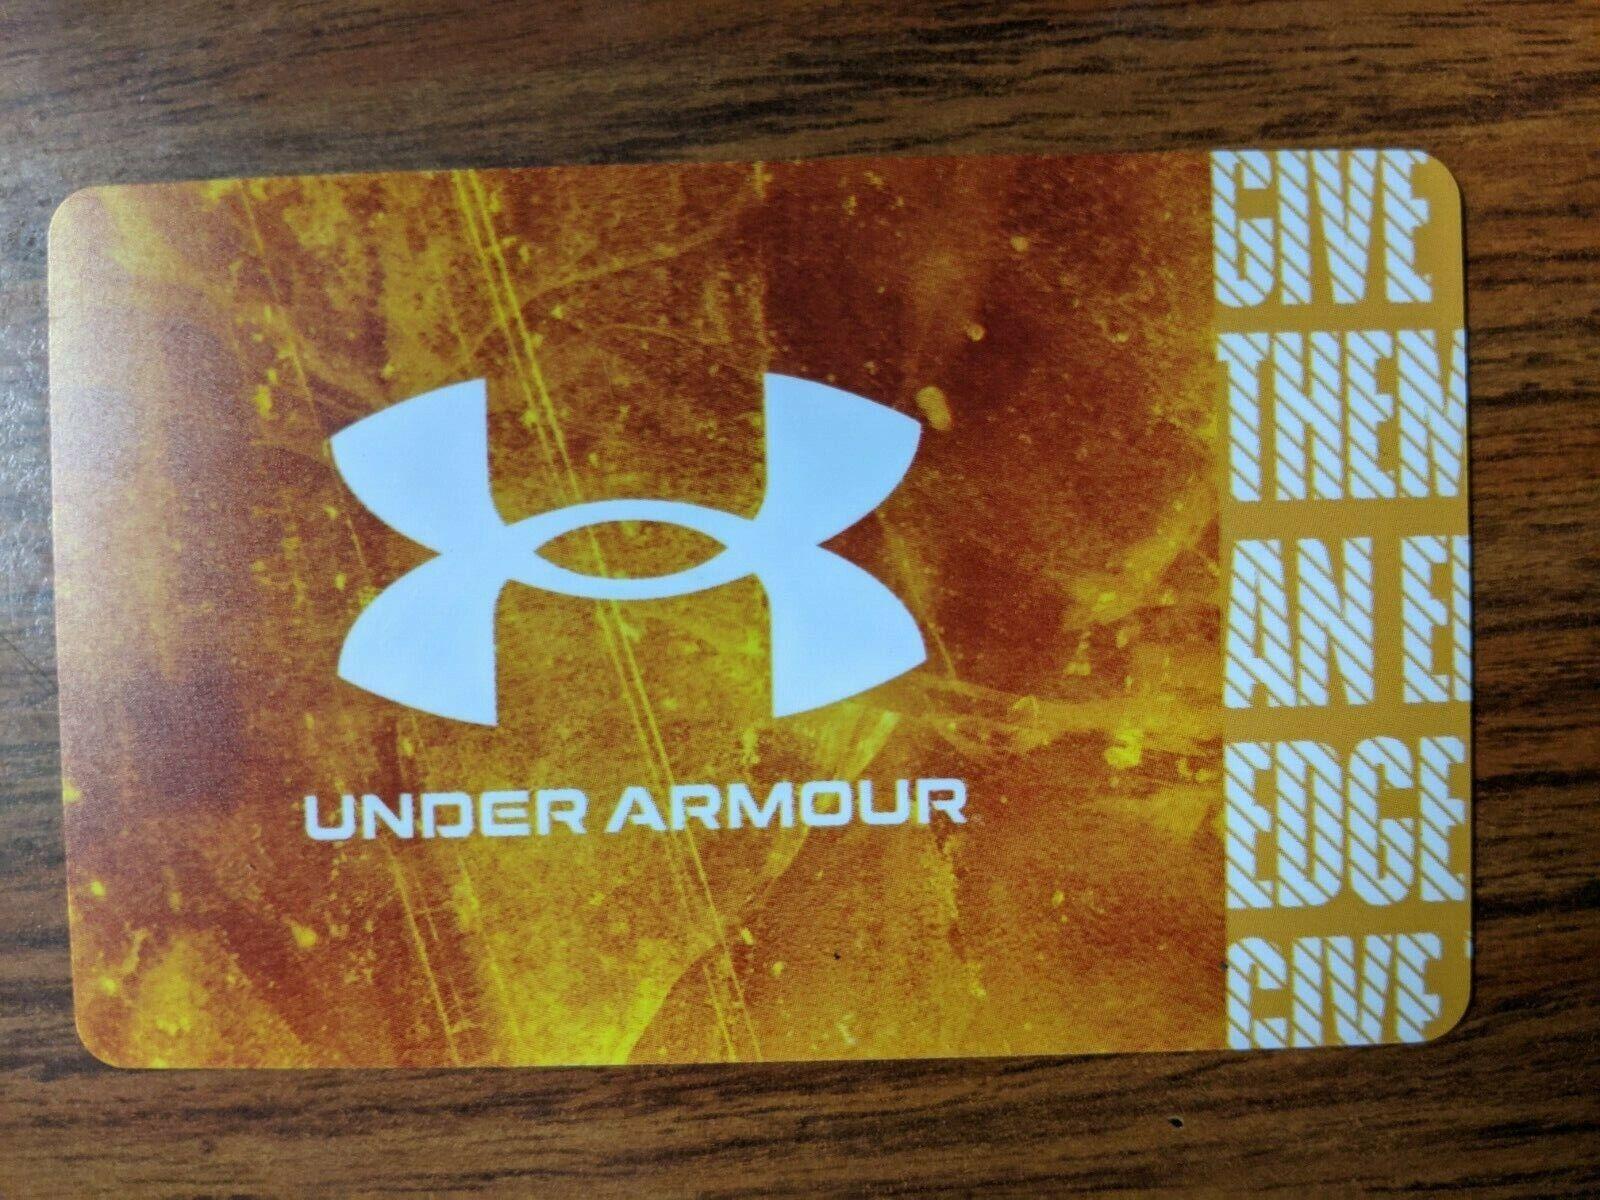 213.00 Under Armour Gift Card Merchandise Credit BALANCE 213.00 - $190.00